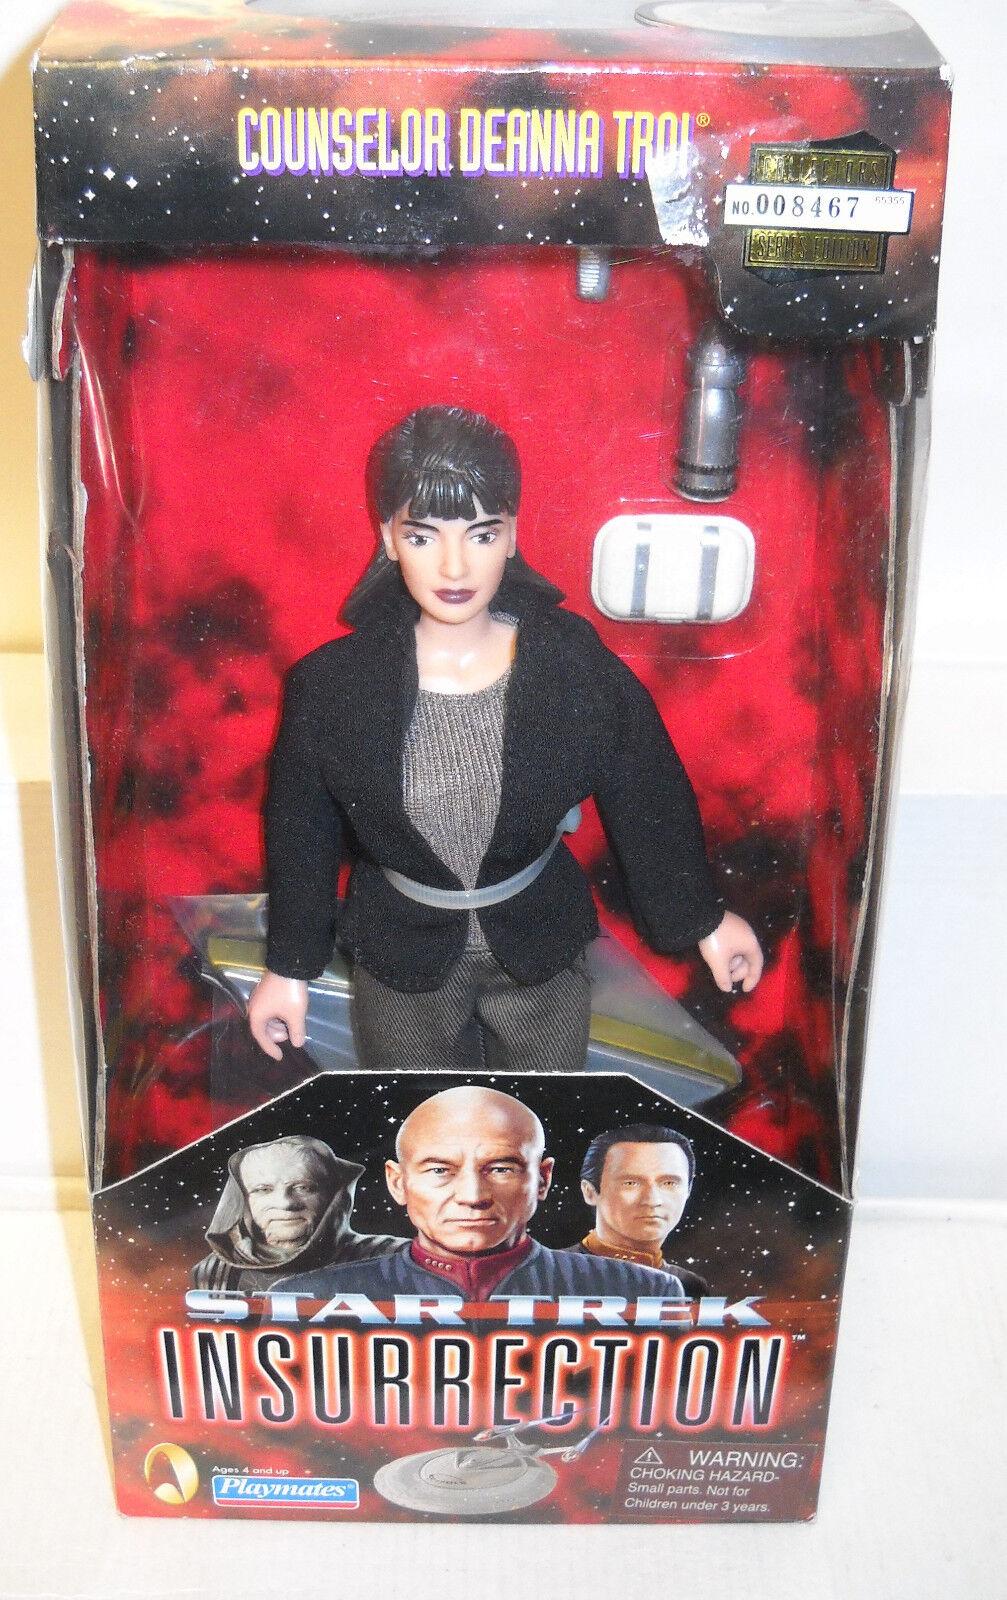 5366 NRFB Playmates Star Trek Insurrection Counselor Deanna Troi